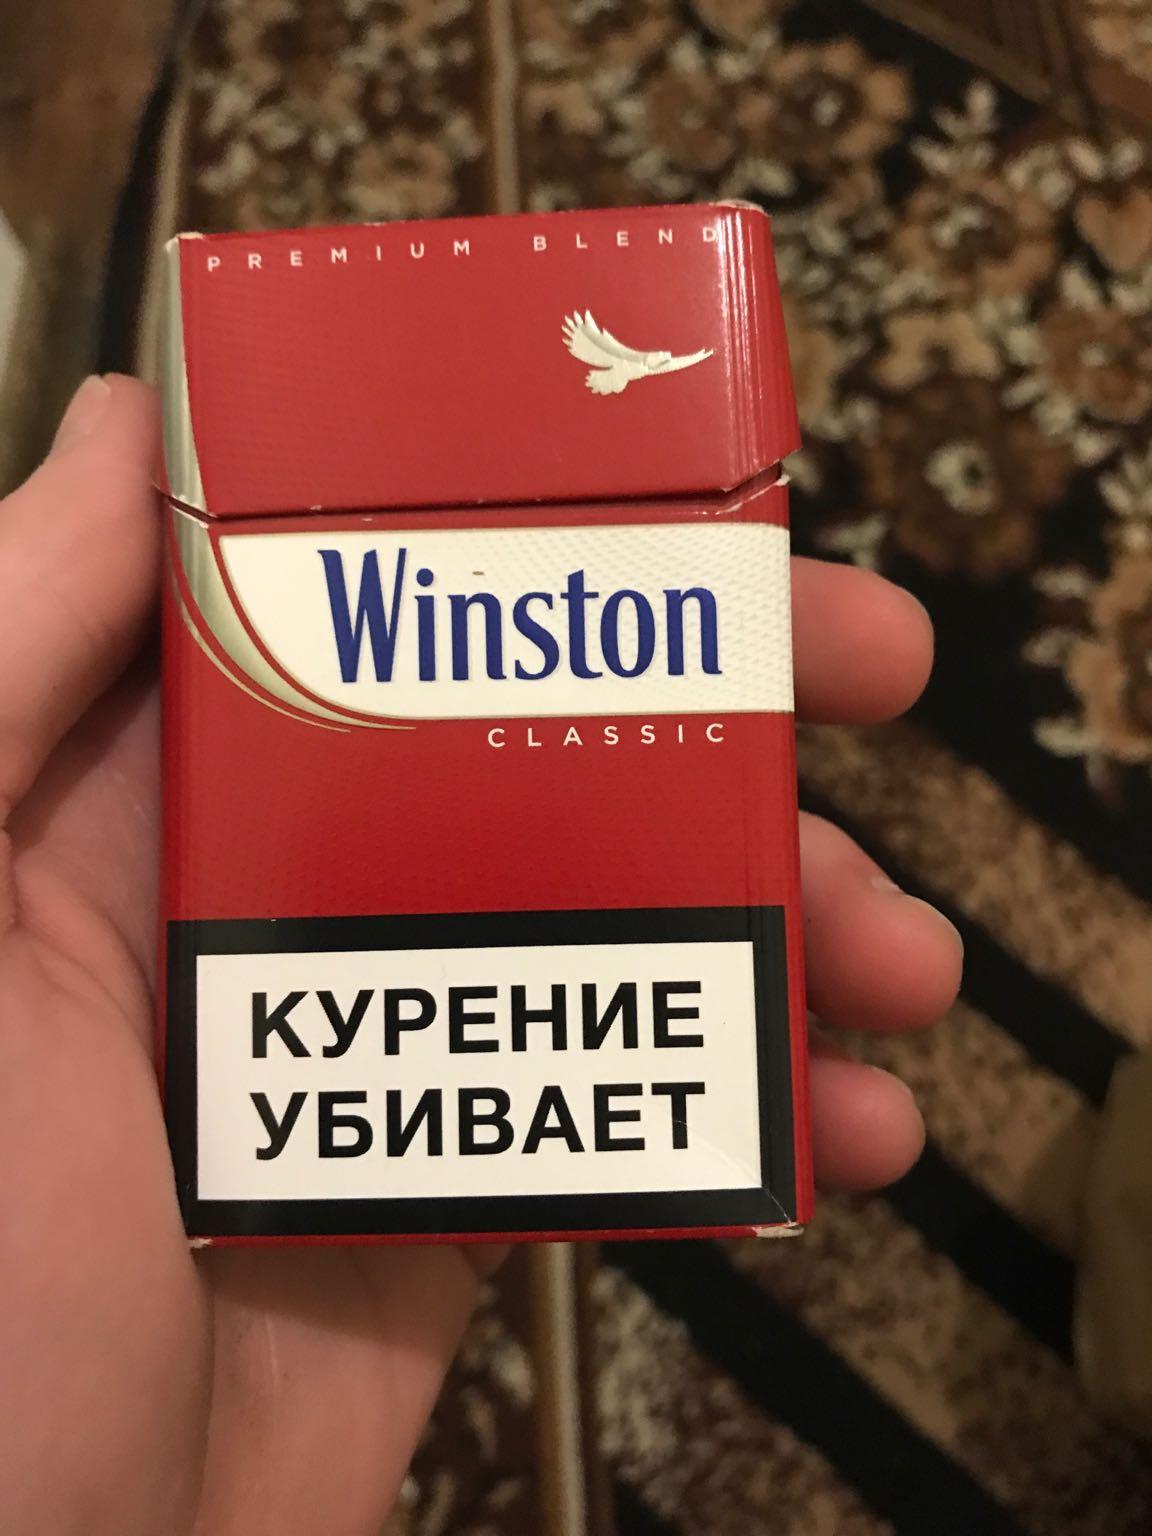 Открытки марта, картинки сигареты винстон